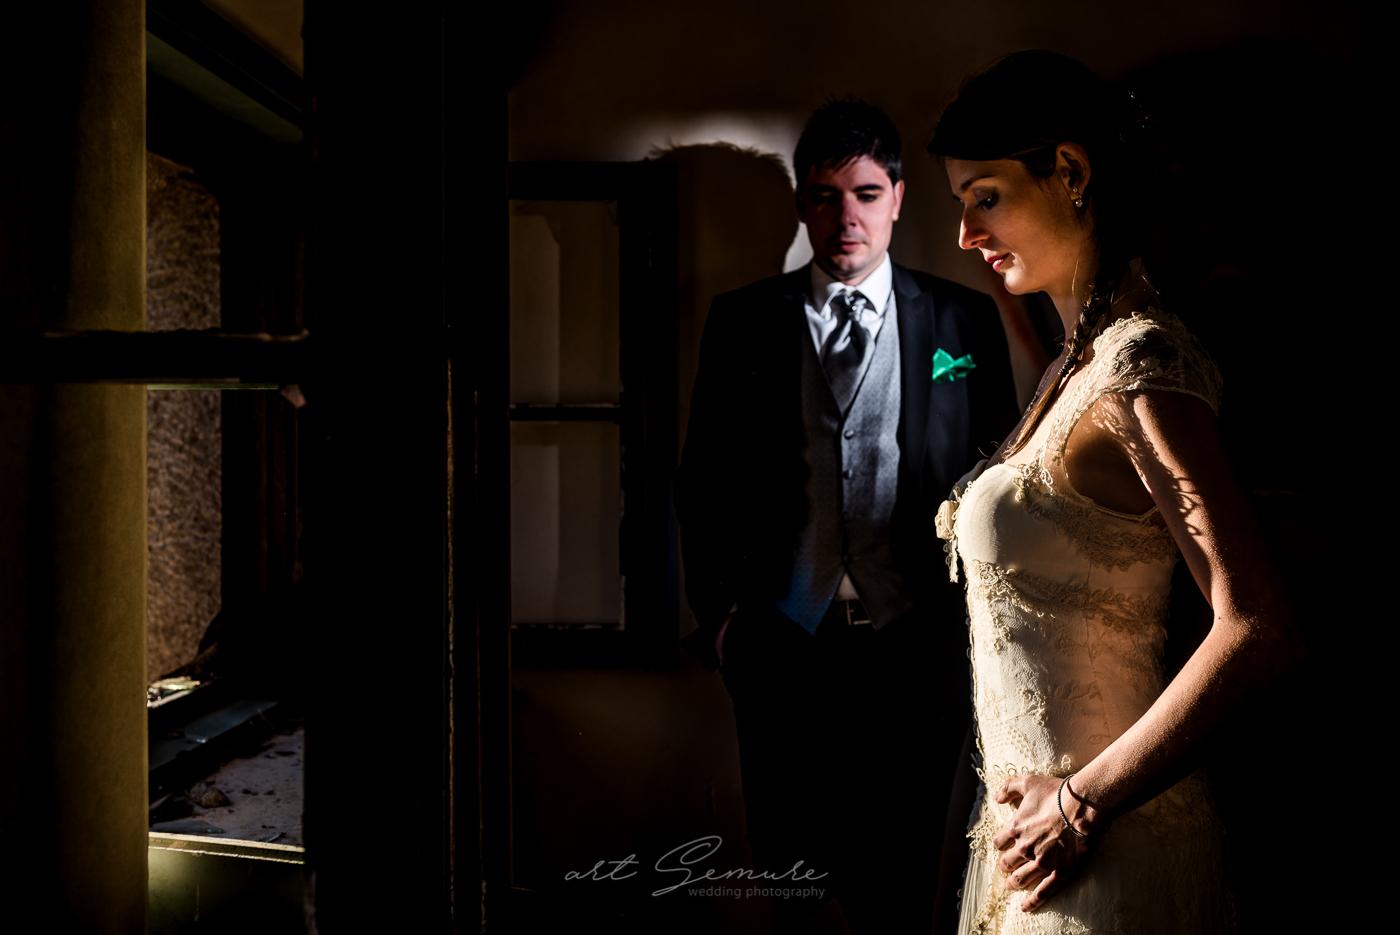 fotografo boda emotiva zamora salto de castro 15_